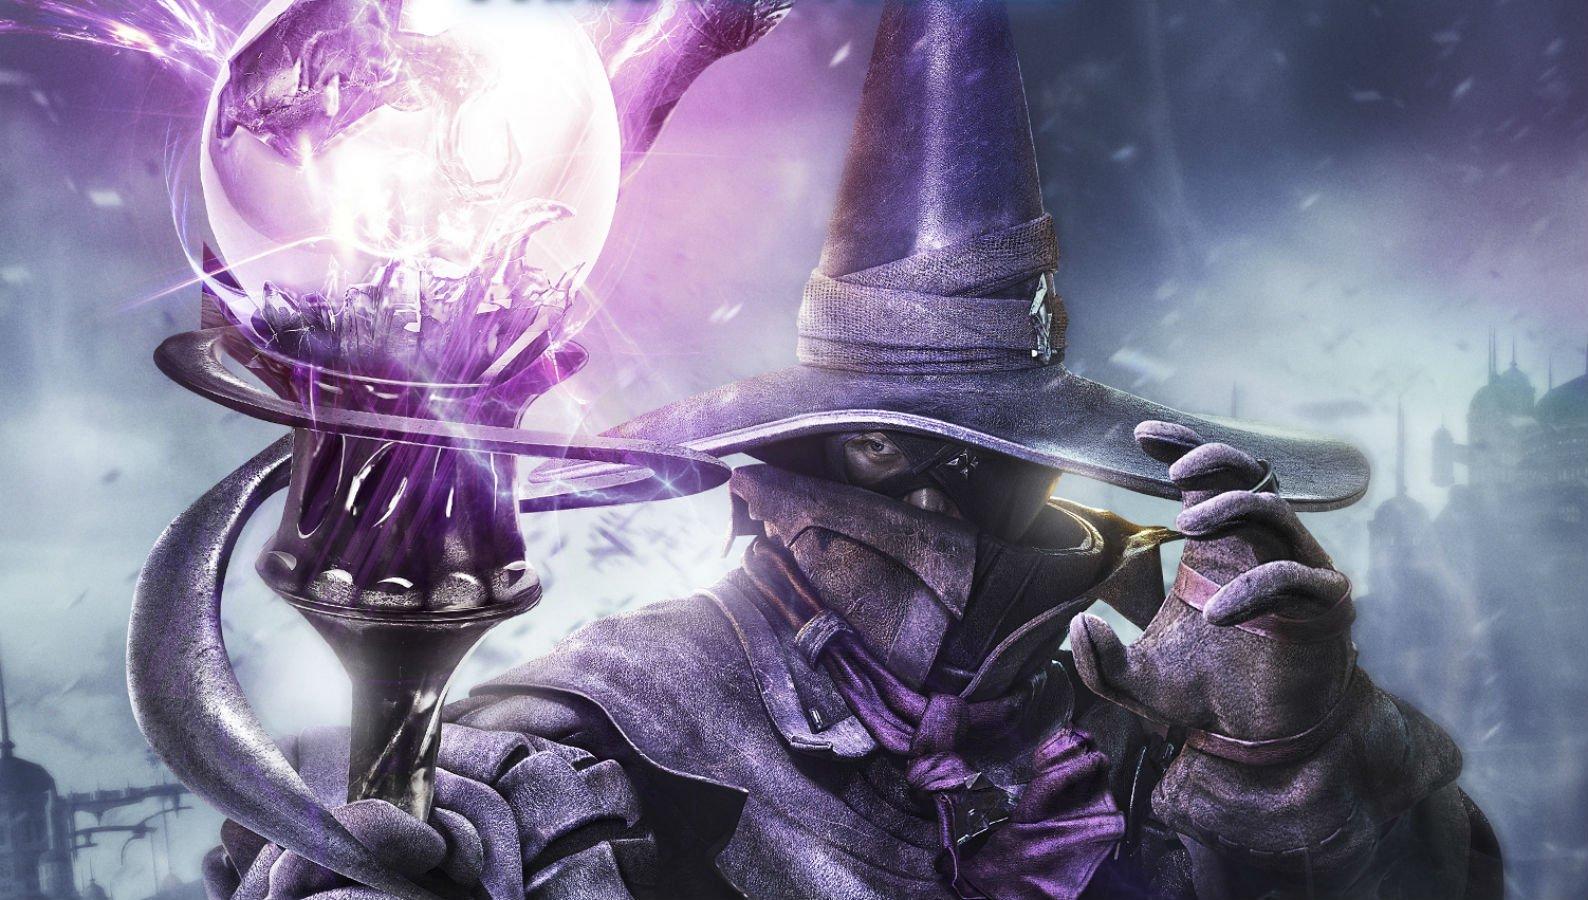 final fantasy 14 a realm reborn wallpaper images